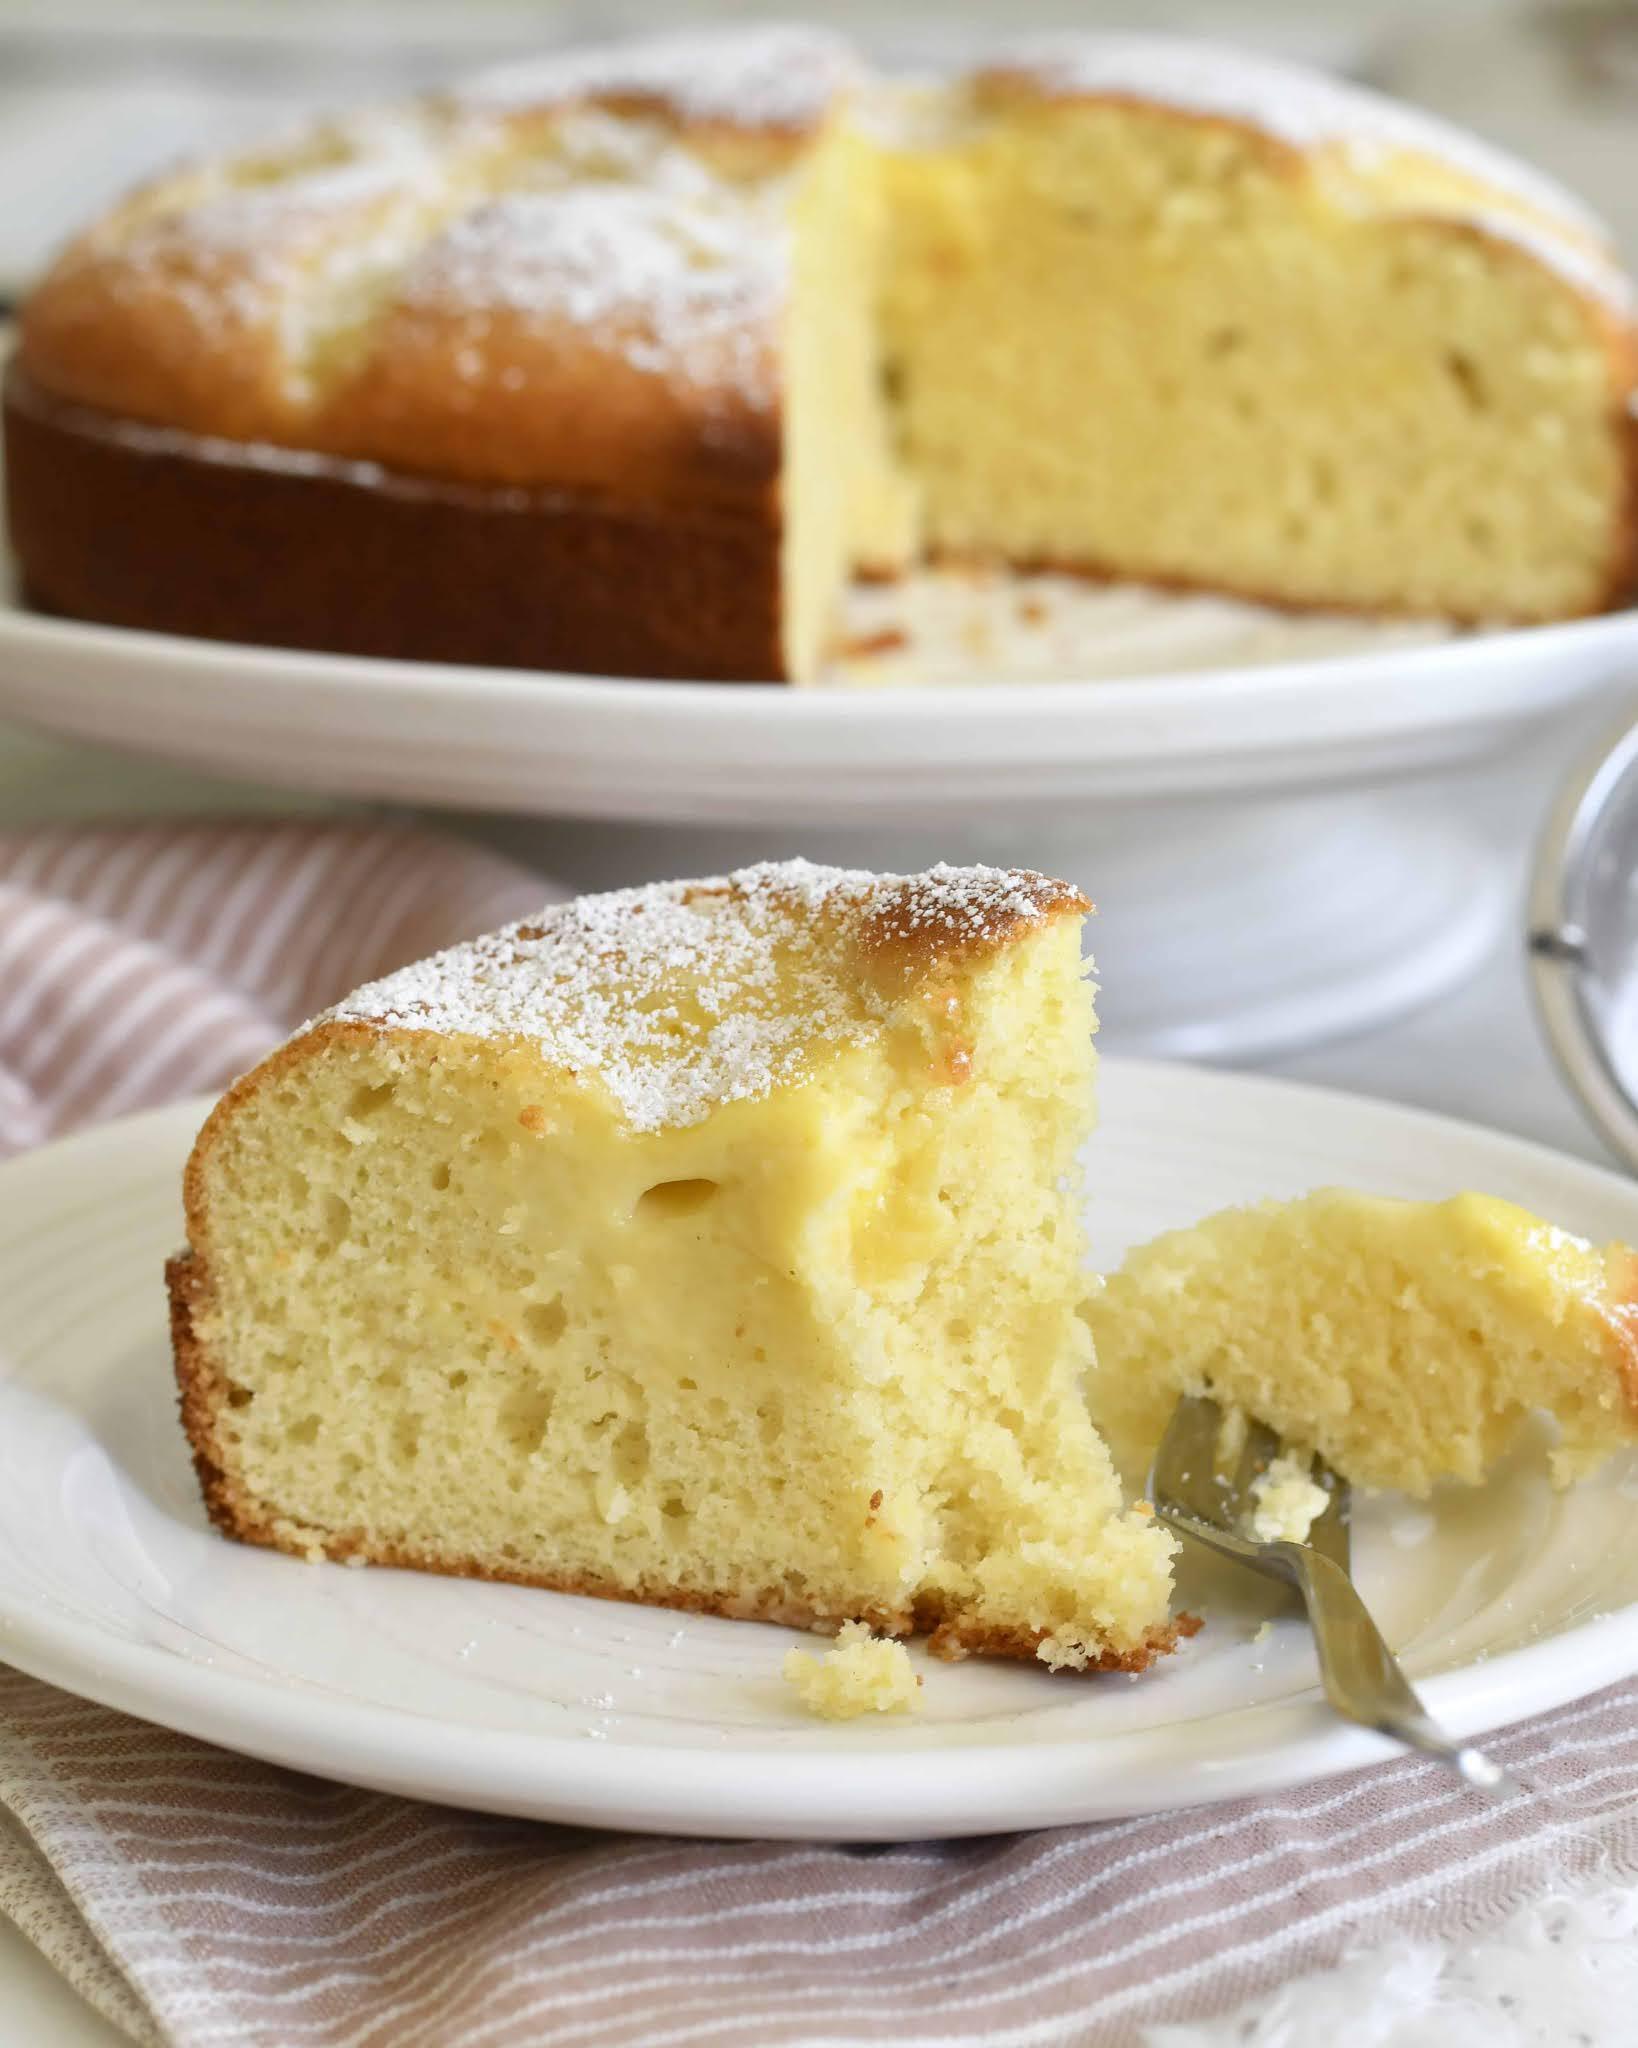 Italian Cake with custard cream